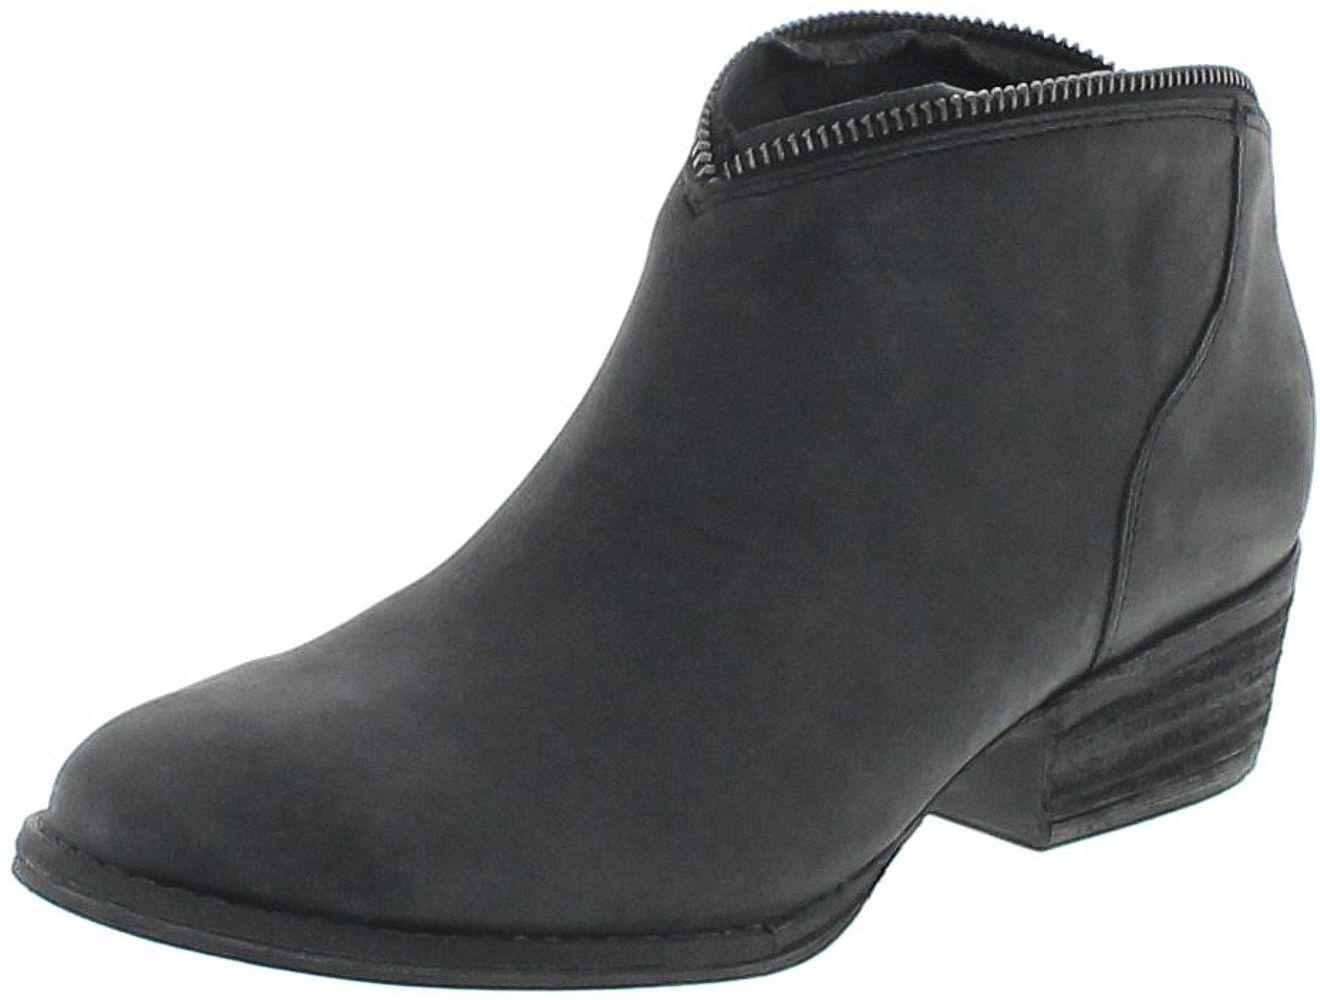 Mezcalero Boots 2033 SOFIA Negro Fashion Stiefelette - schwarz